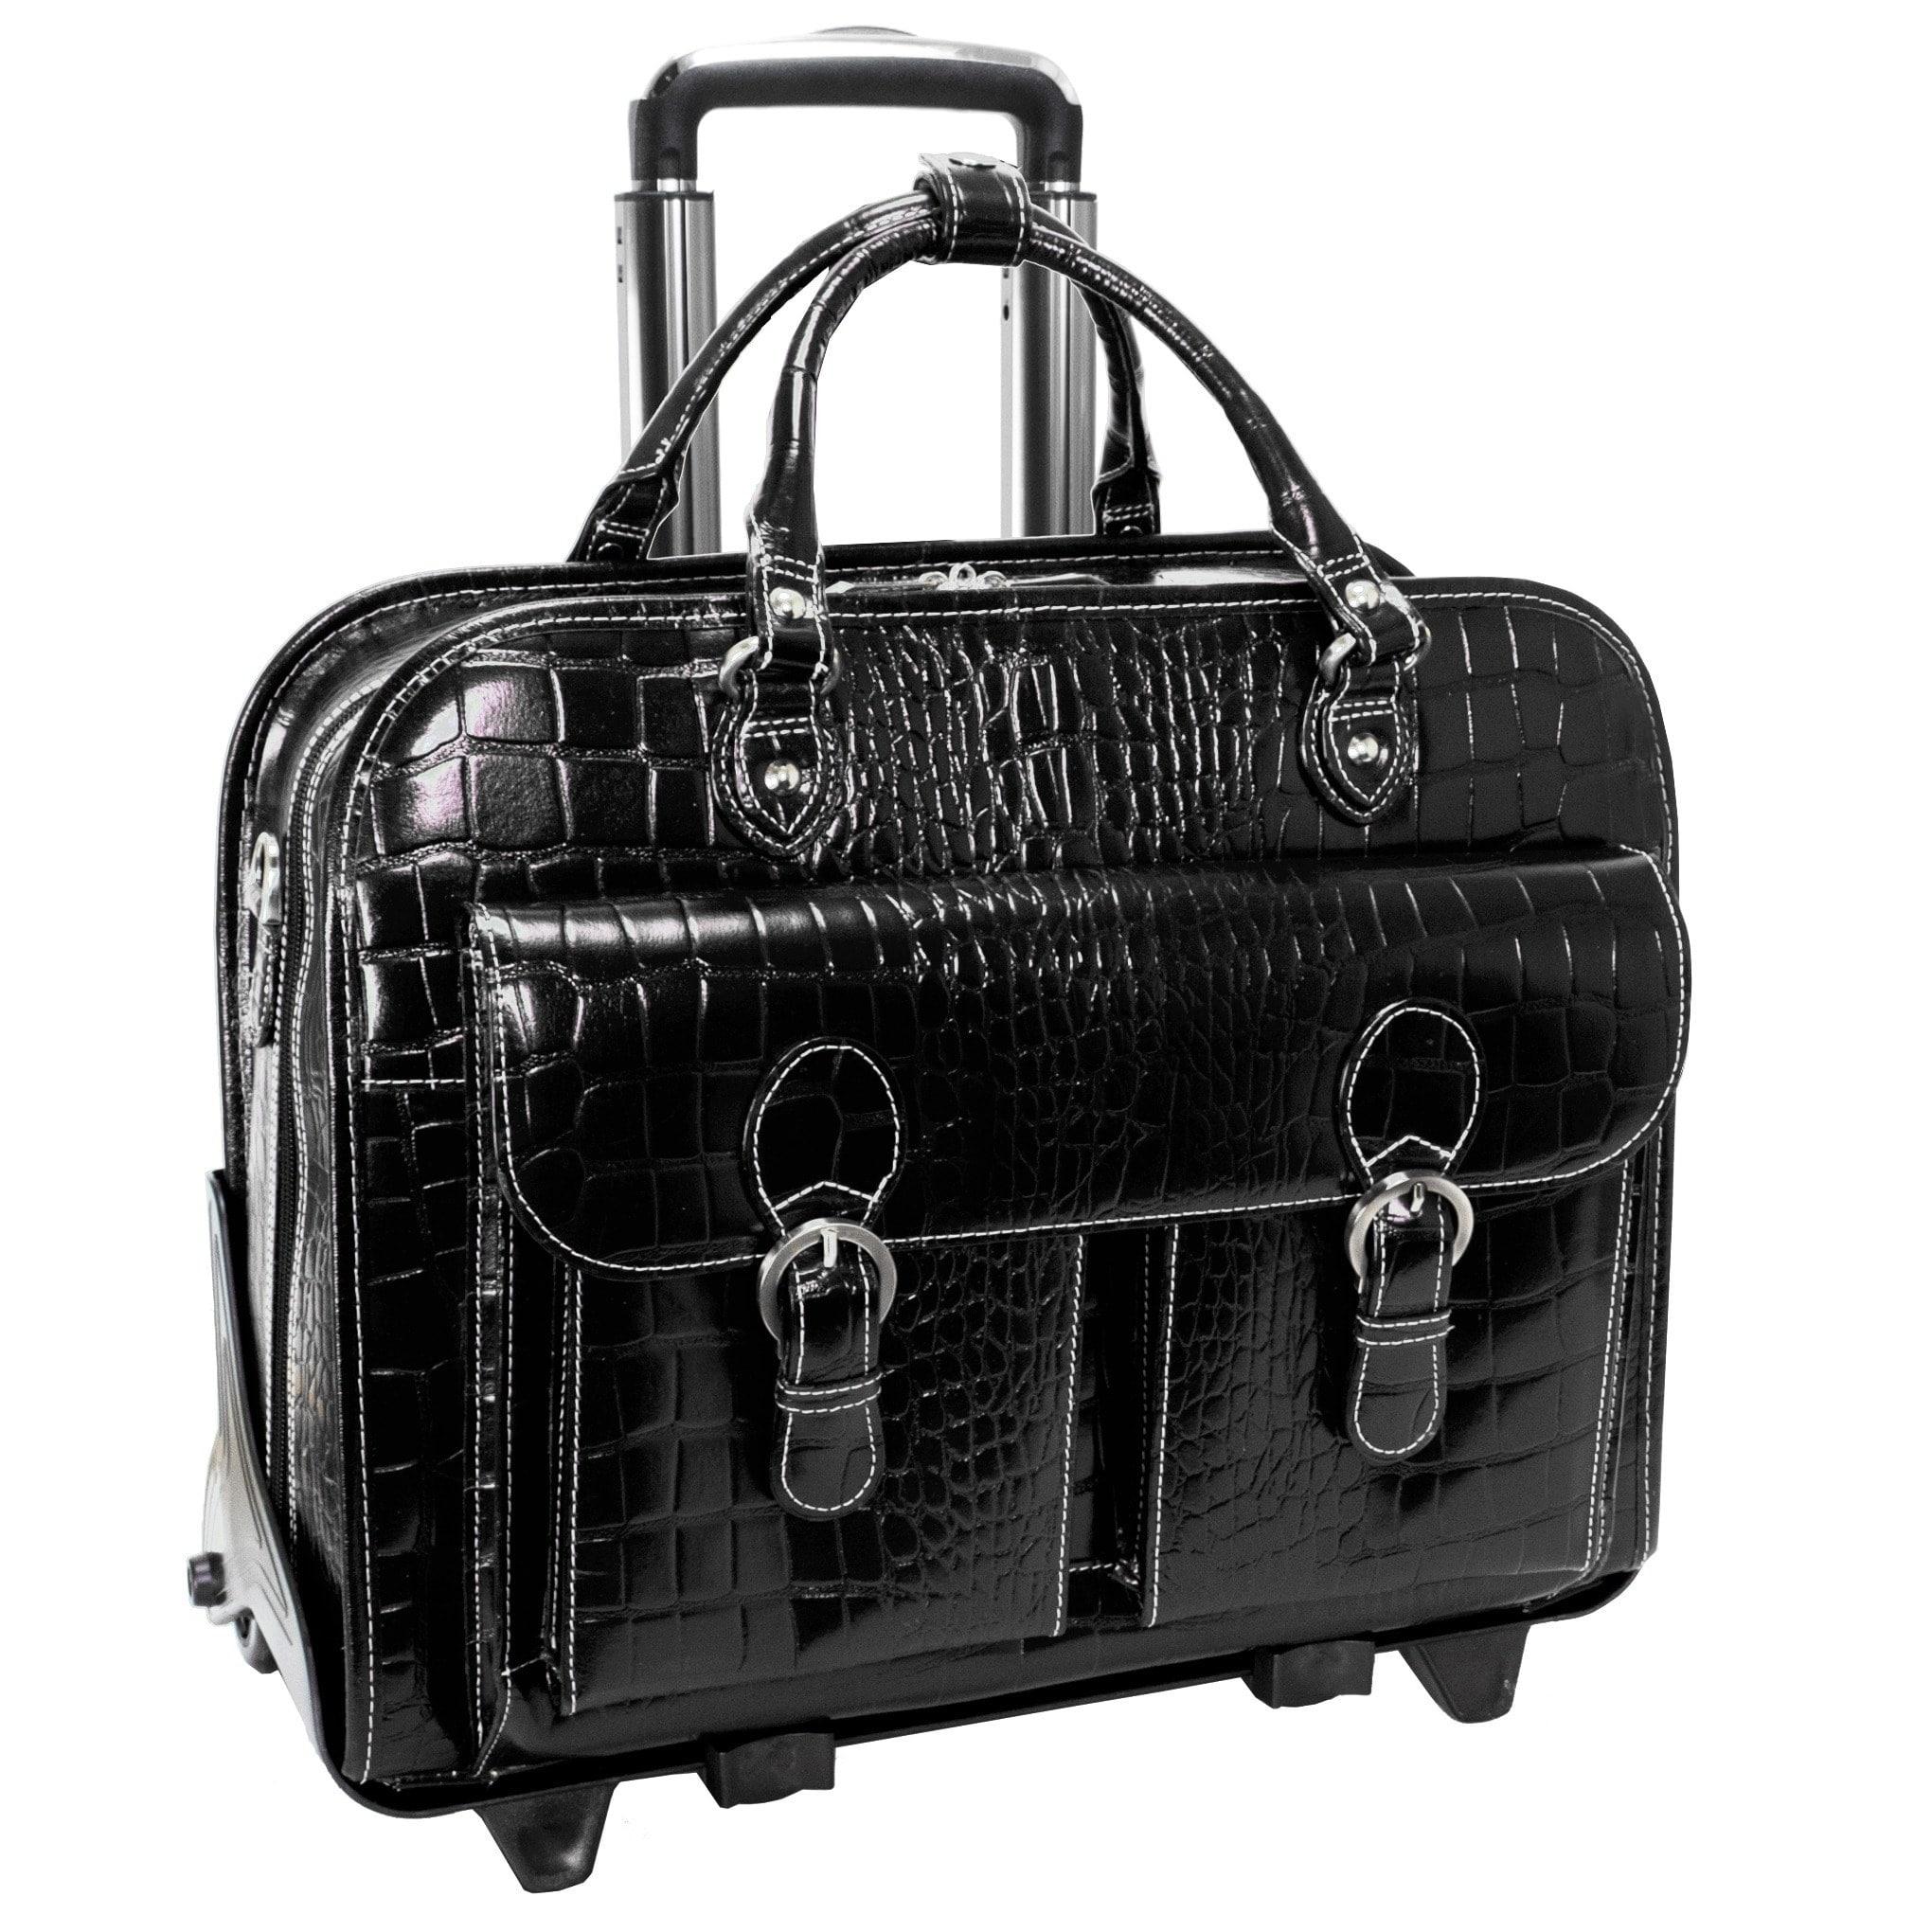 Siamod Siamod 'San Martino' Women's Leather Detachable Wheeled Laptop Case